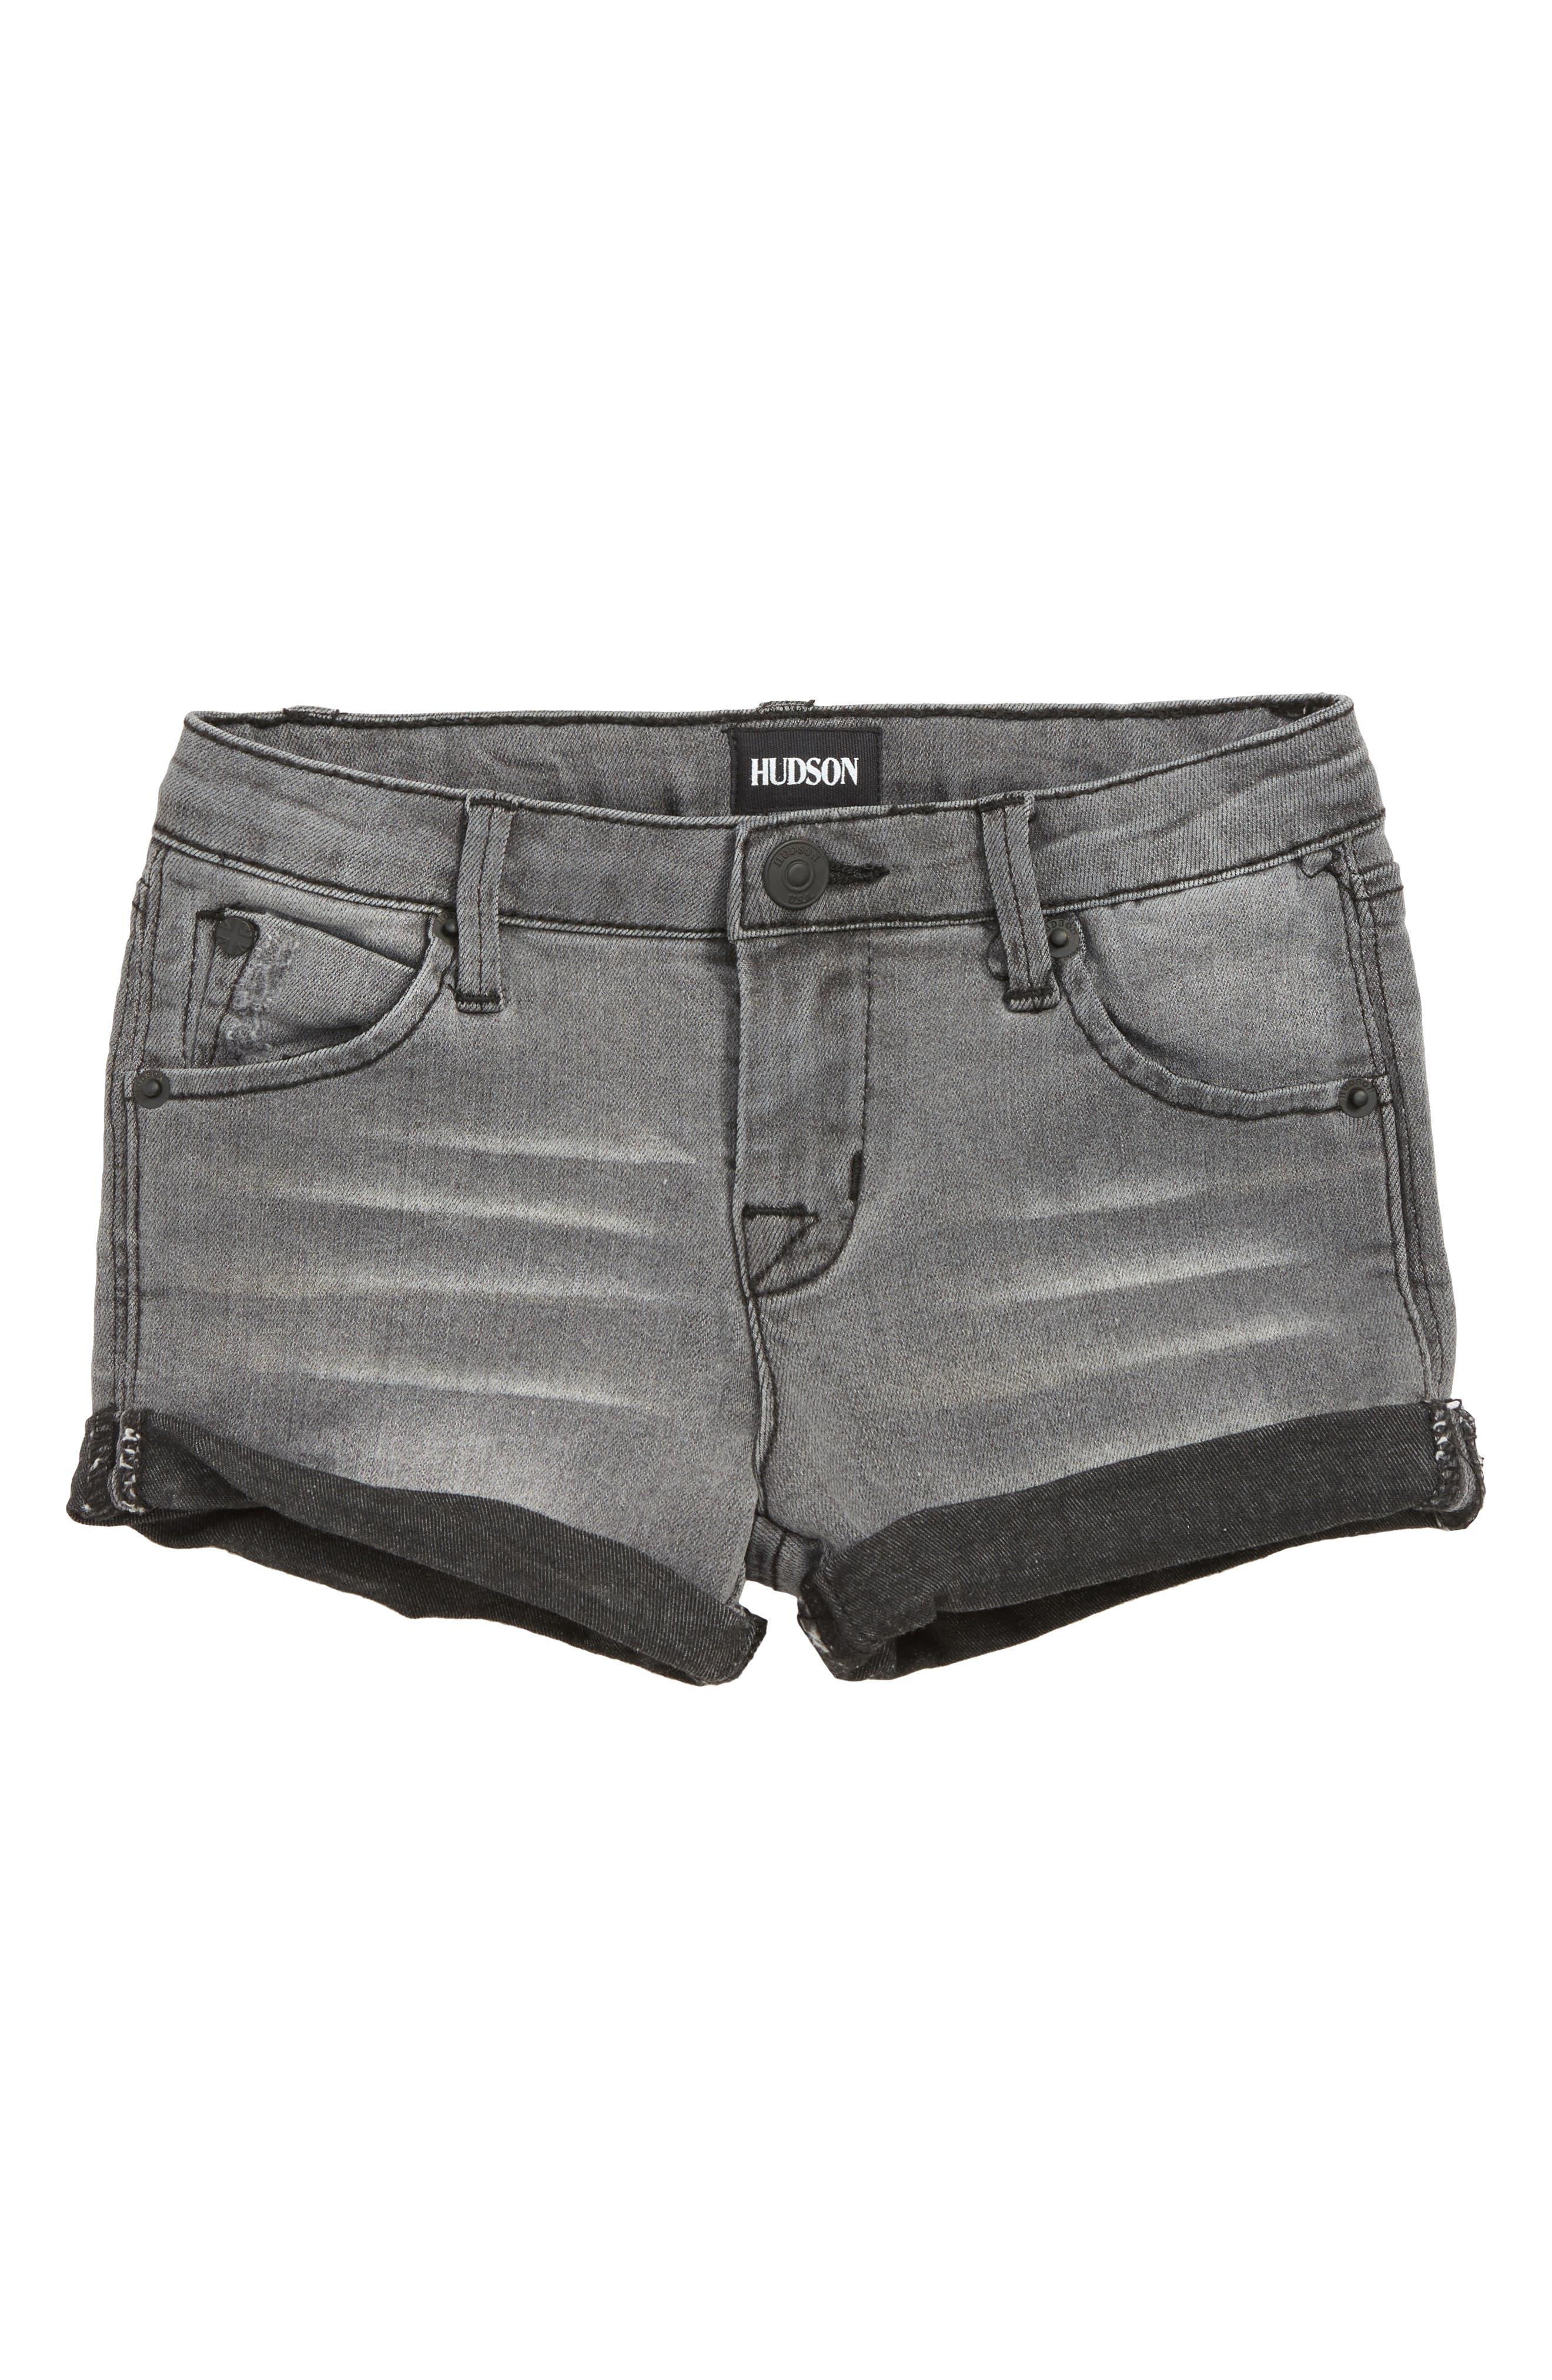 Roll Cuff Denim Shorts,                             Main thumbnail 1, color,                             001